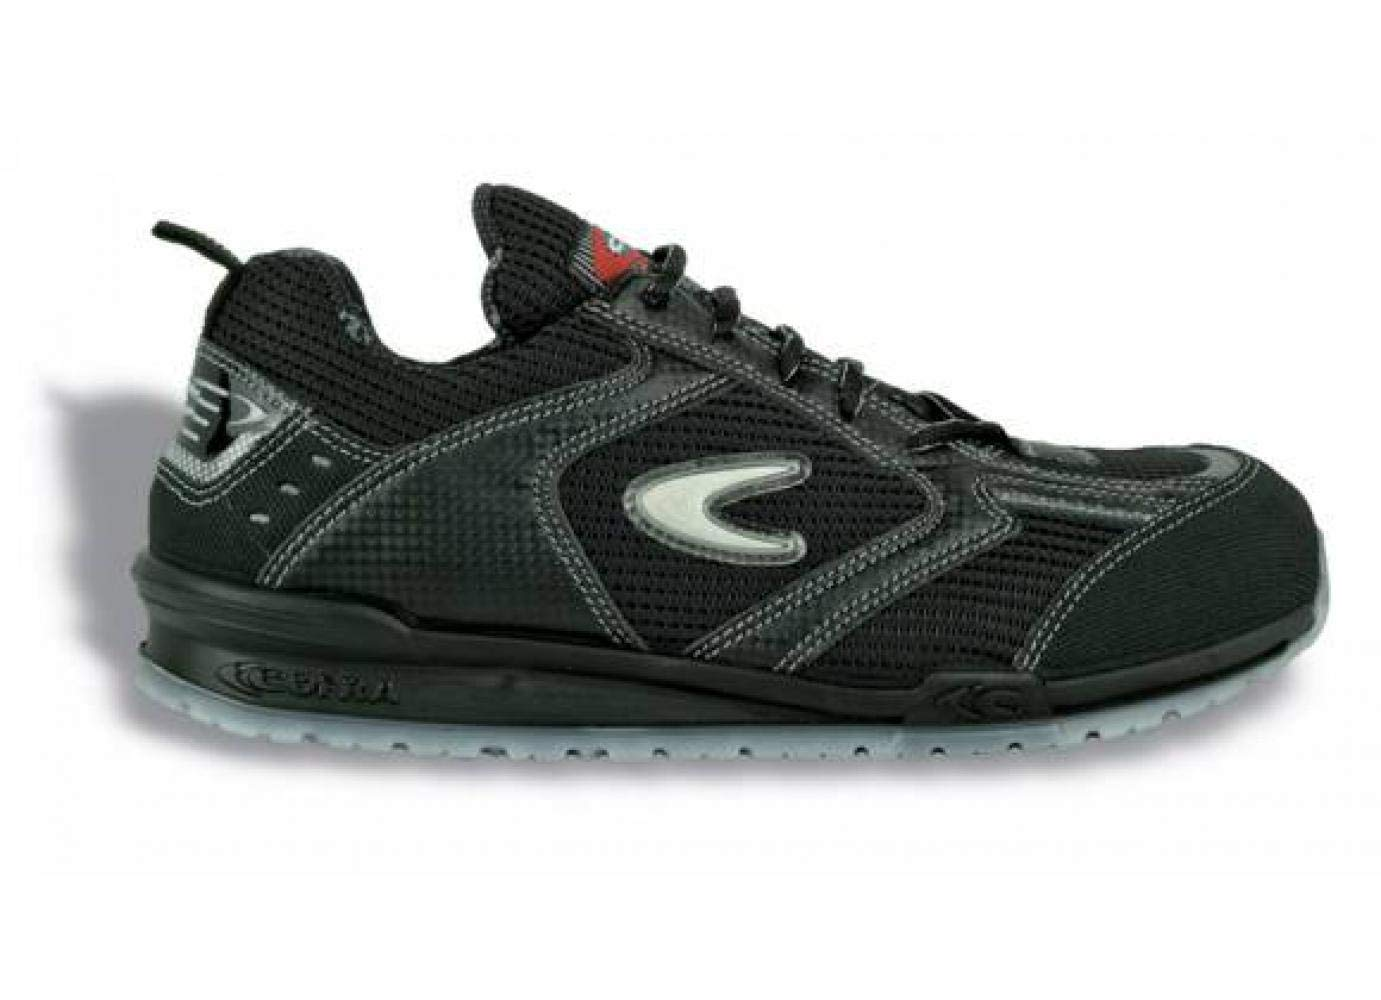 - Loppoli Petri cofra s1p SRC tg. 44 1 Safety Work shoes, Multicoloured, One Size